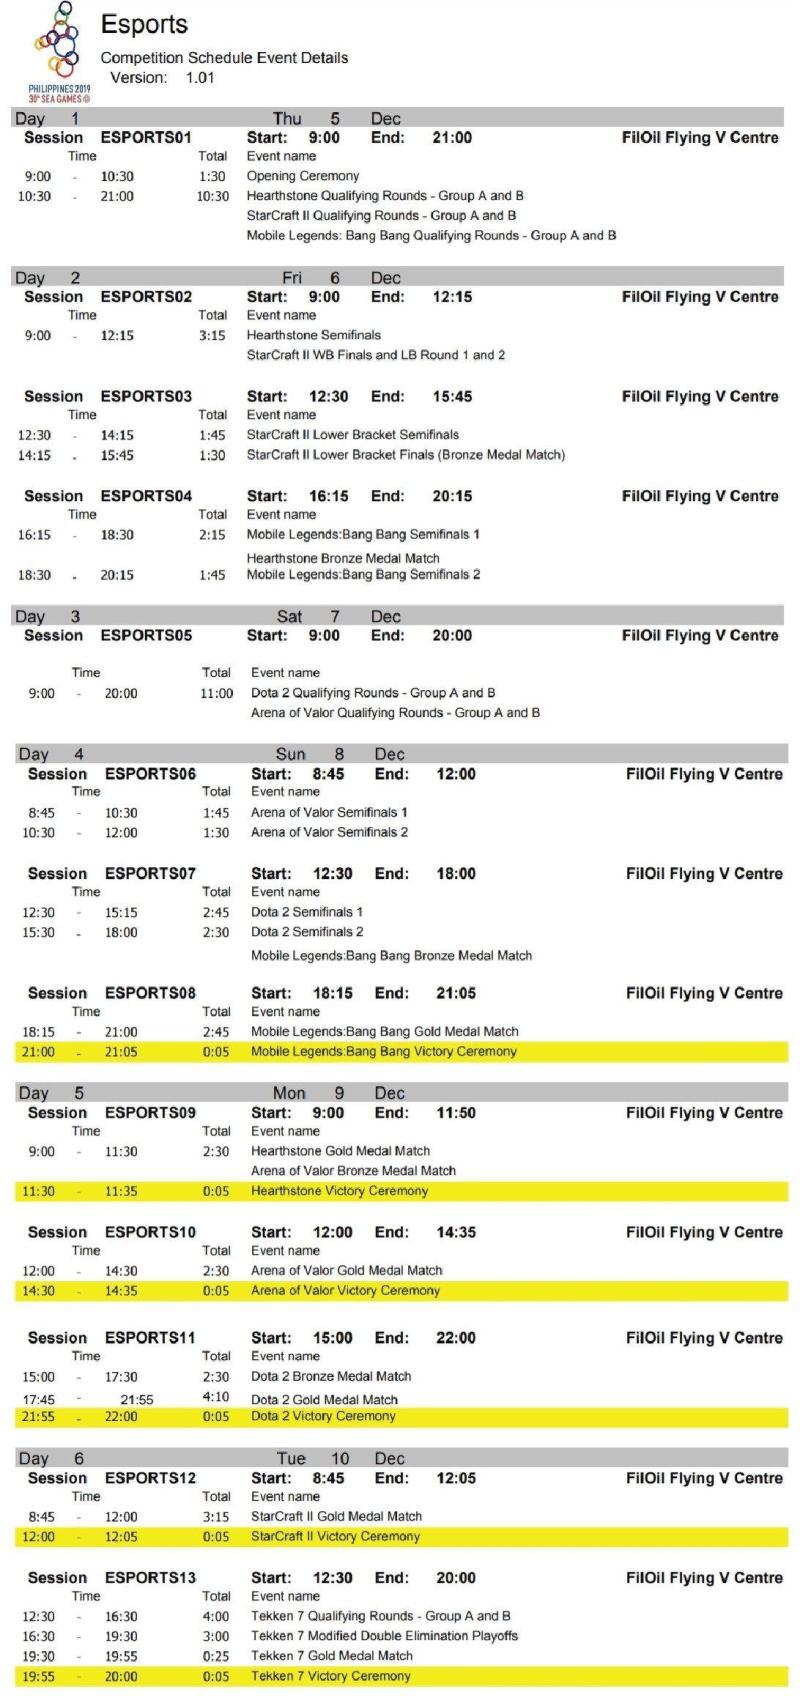 SEA Games Esports schedule